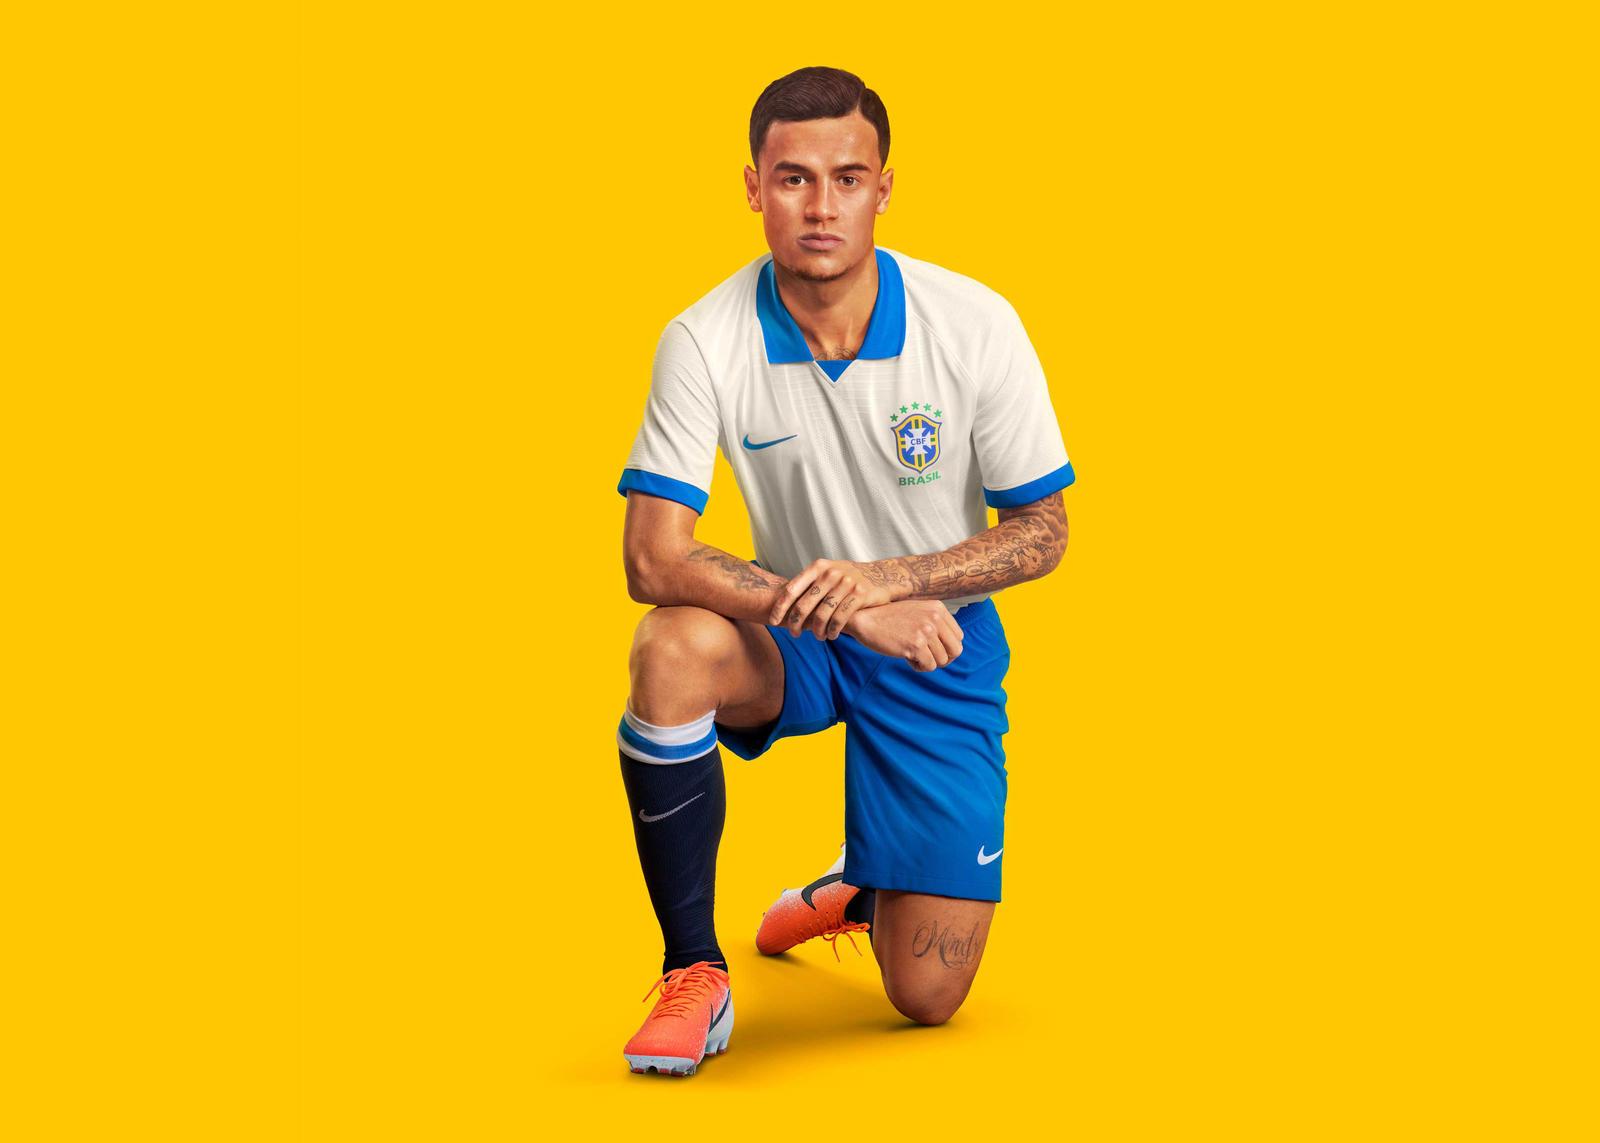 nike-brasil-copa-america-100th-anniversary-jersey-6_rectangle_1600